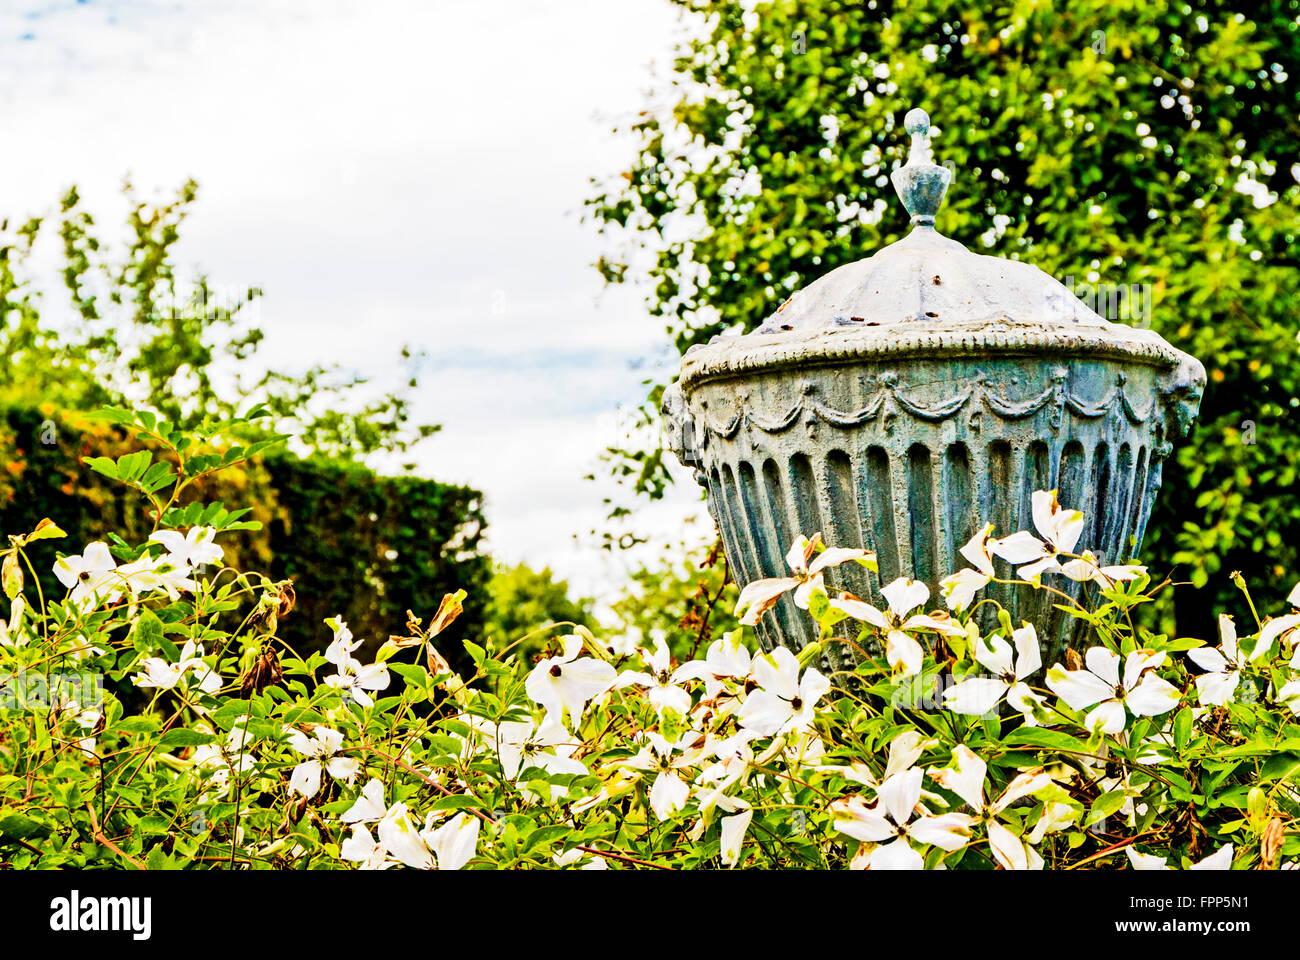 Steinplastik in Einem Berühmten Garten Stockbild